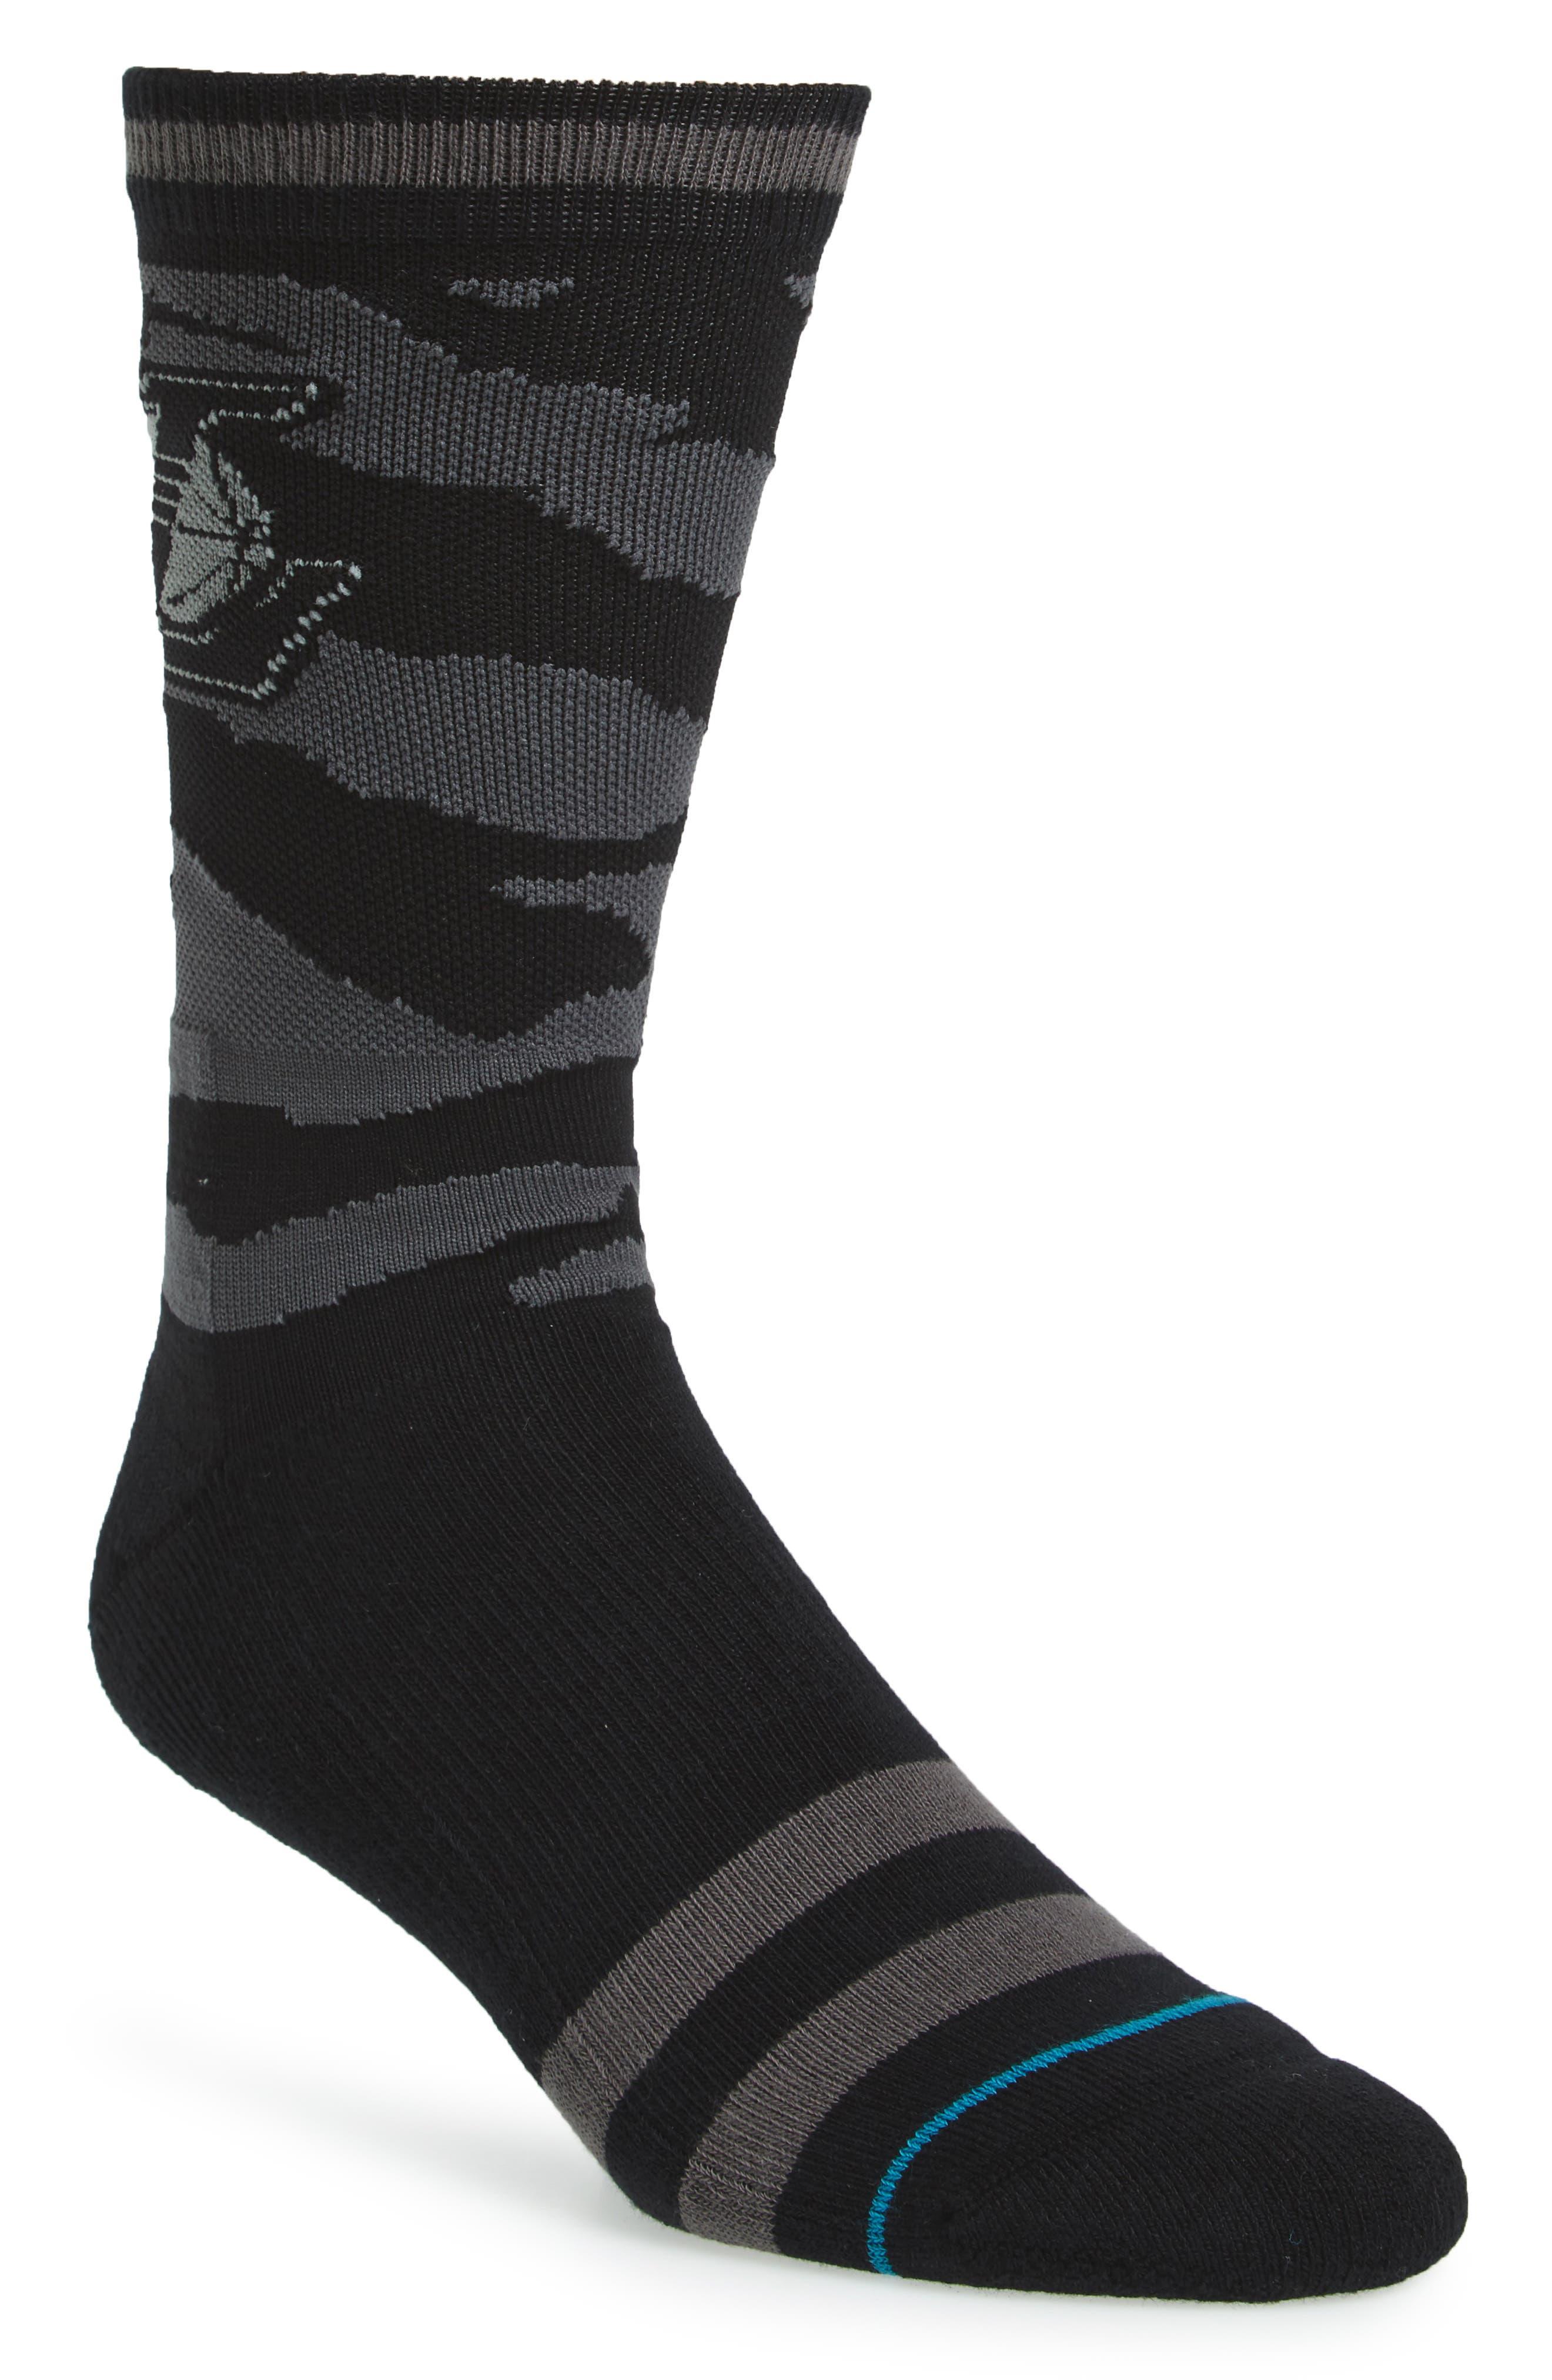 Main Image - Stance NBA Casual Nightfall Lakers Socks